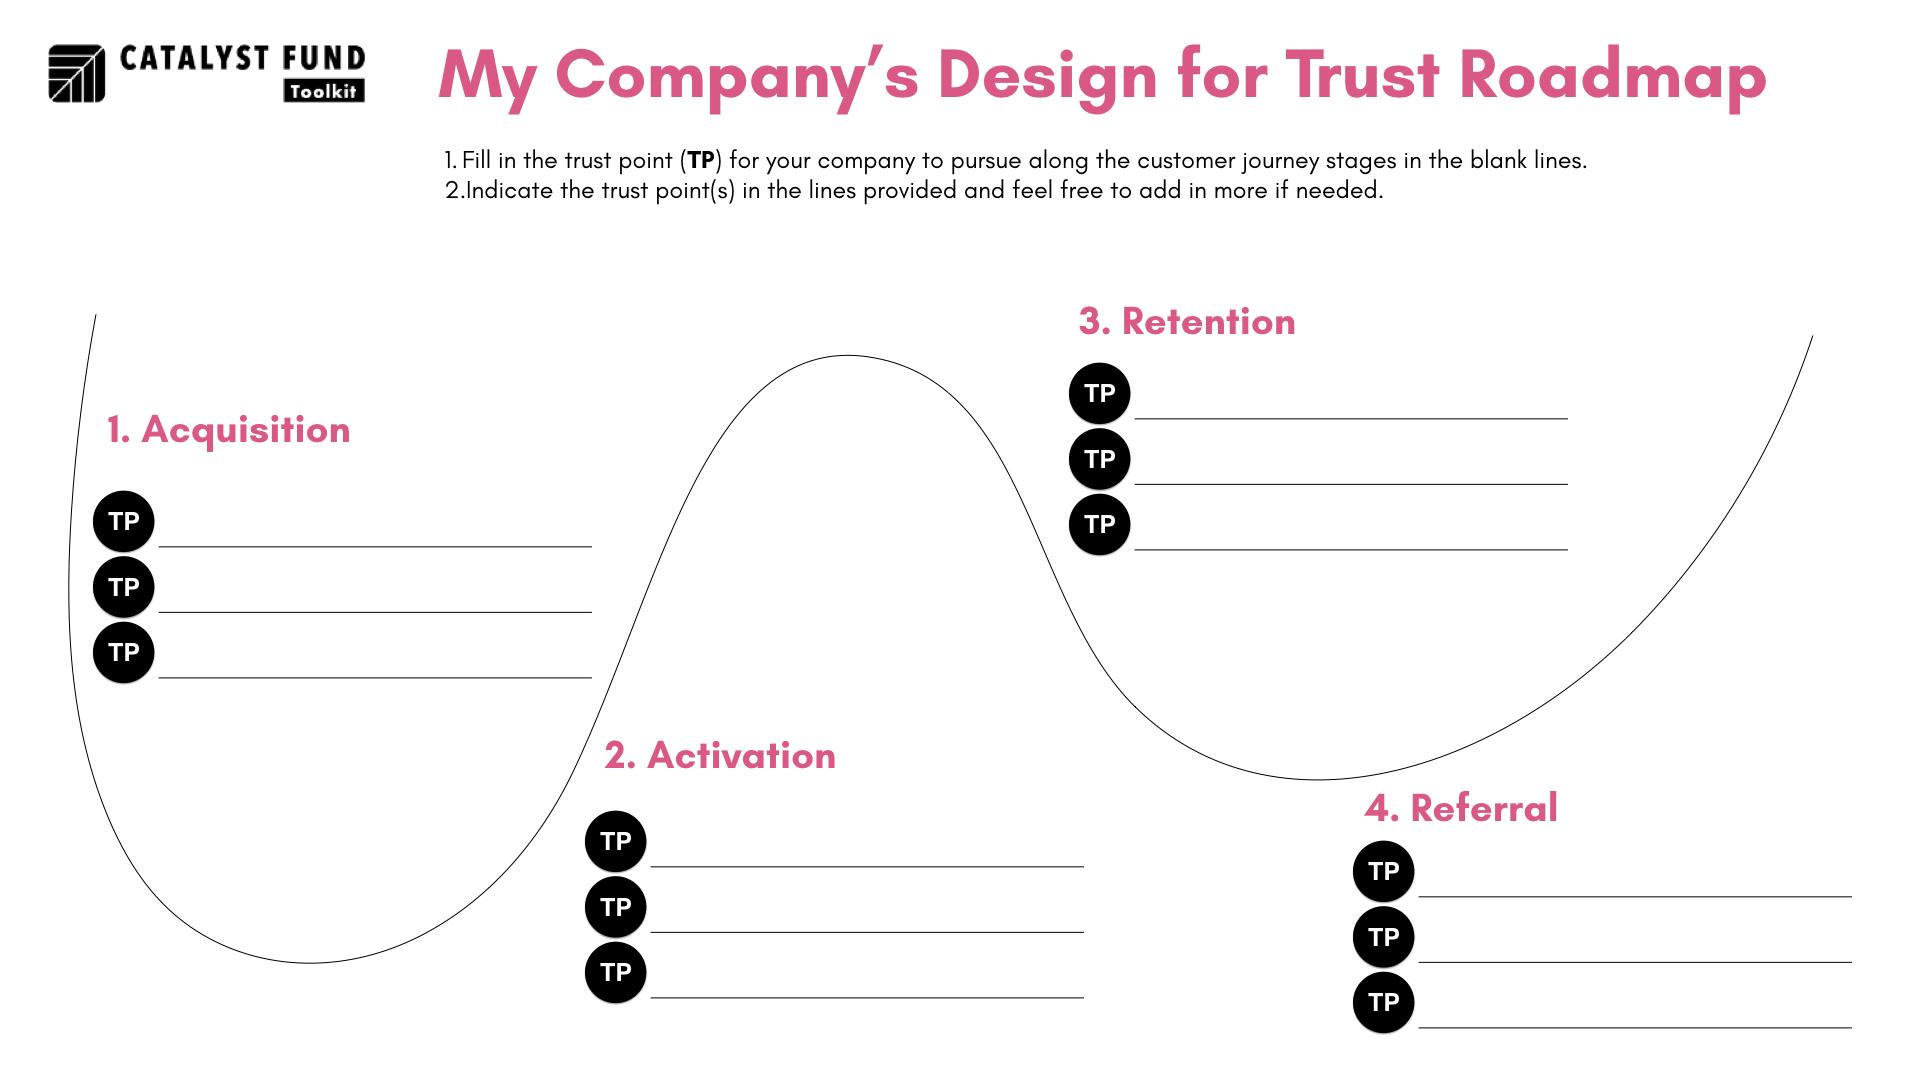 Catalyst Fund Design for Trust Roadmap.jpeg